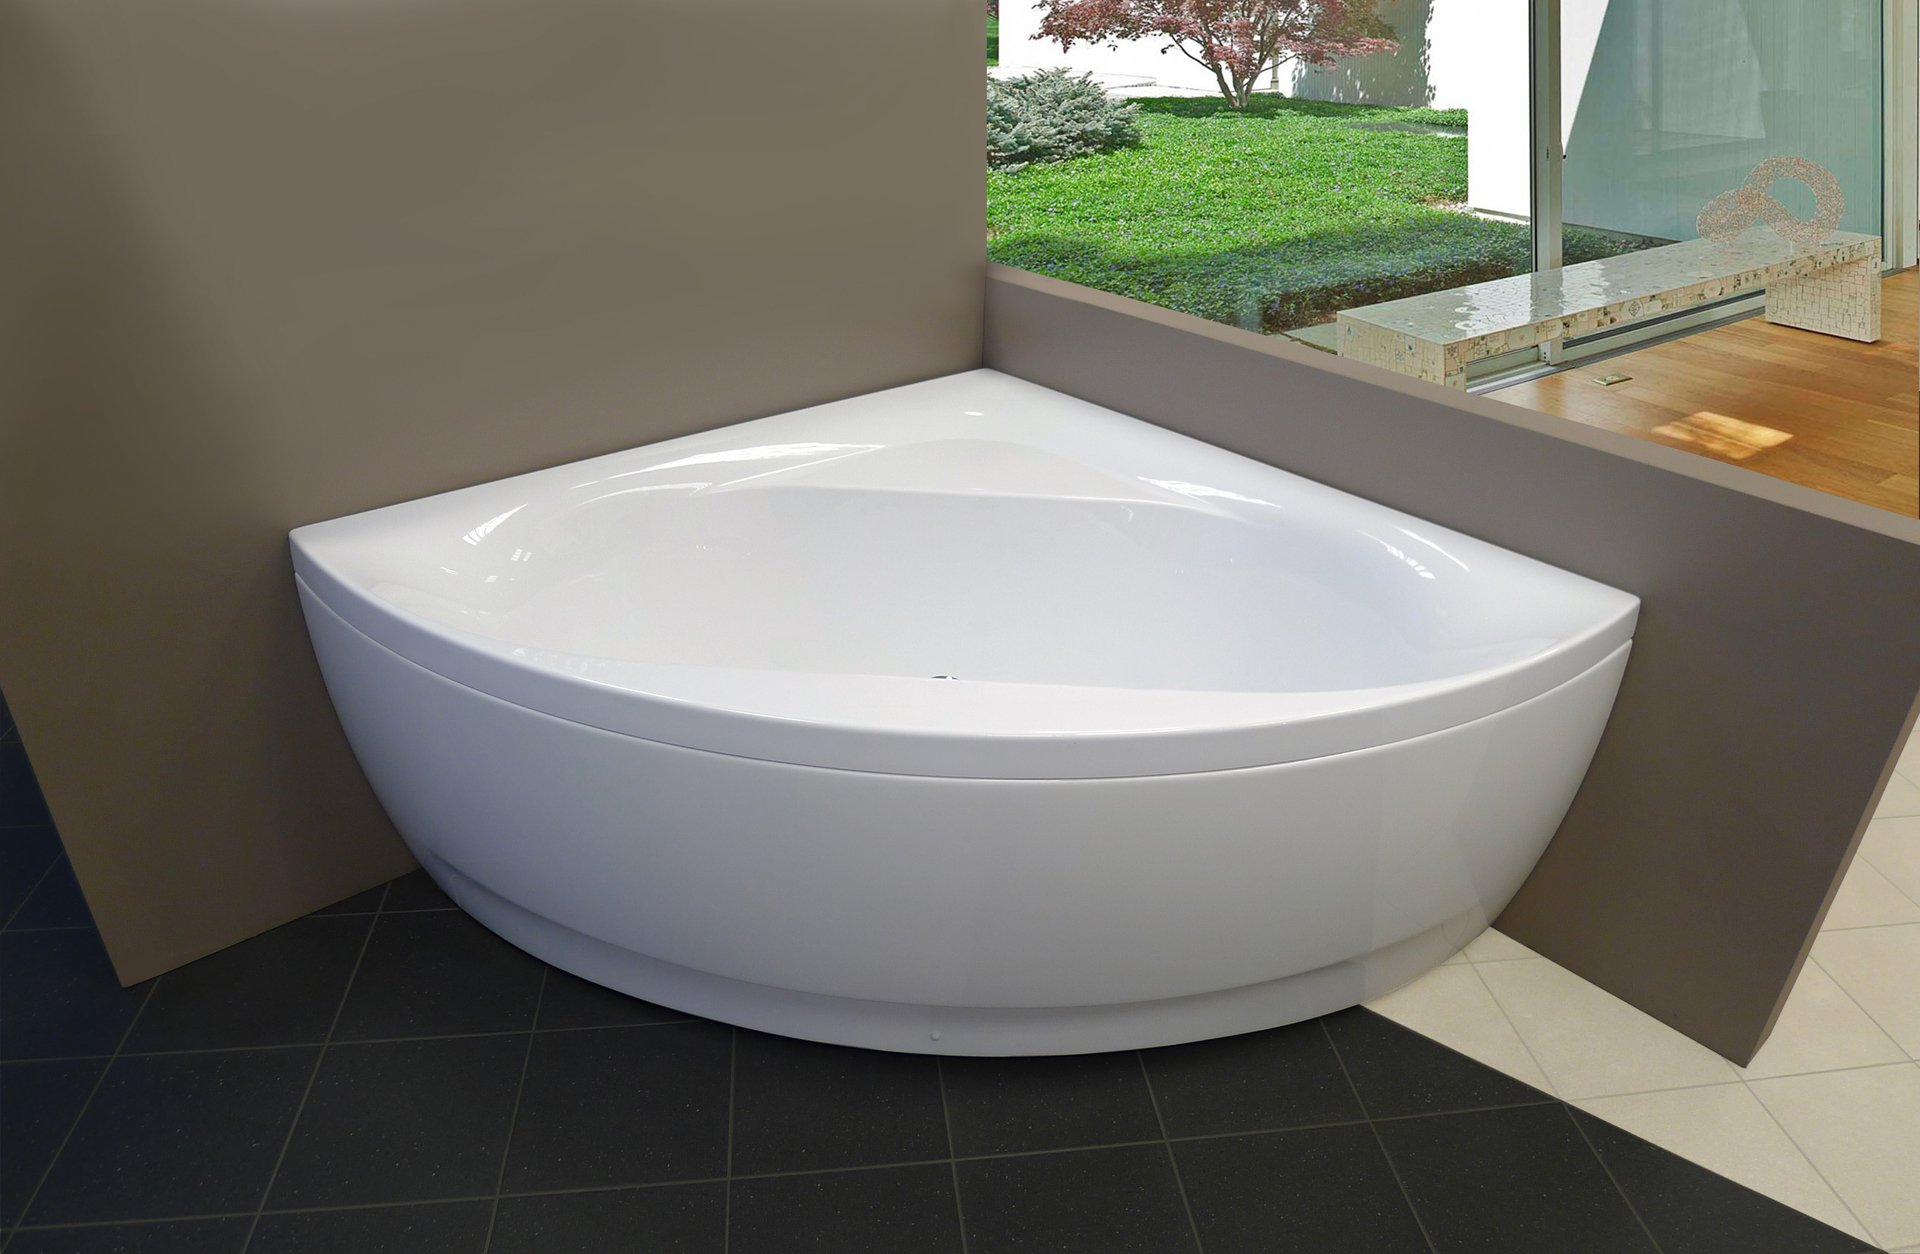 Aquatica Olivia Wht Acrylic Corner Bathtub